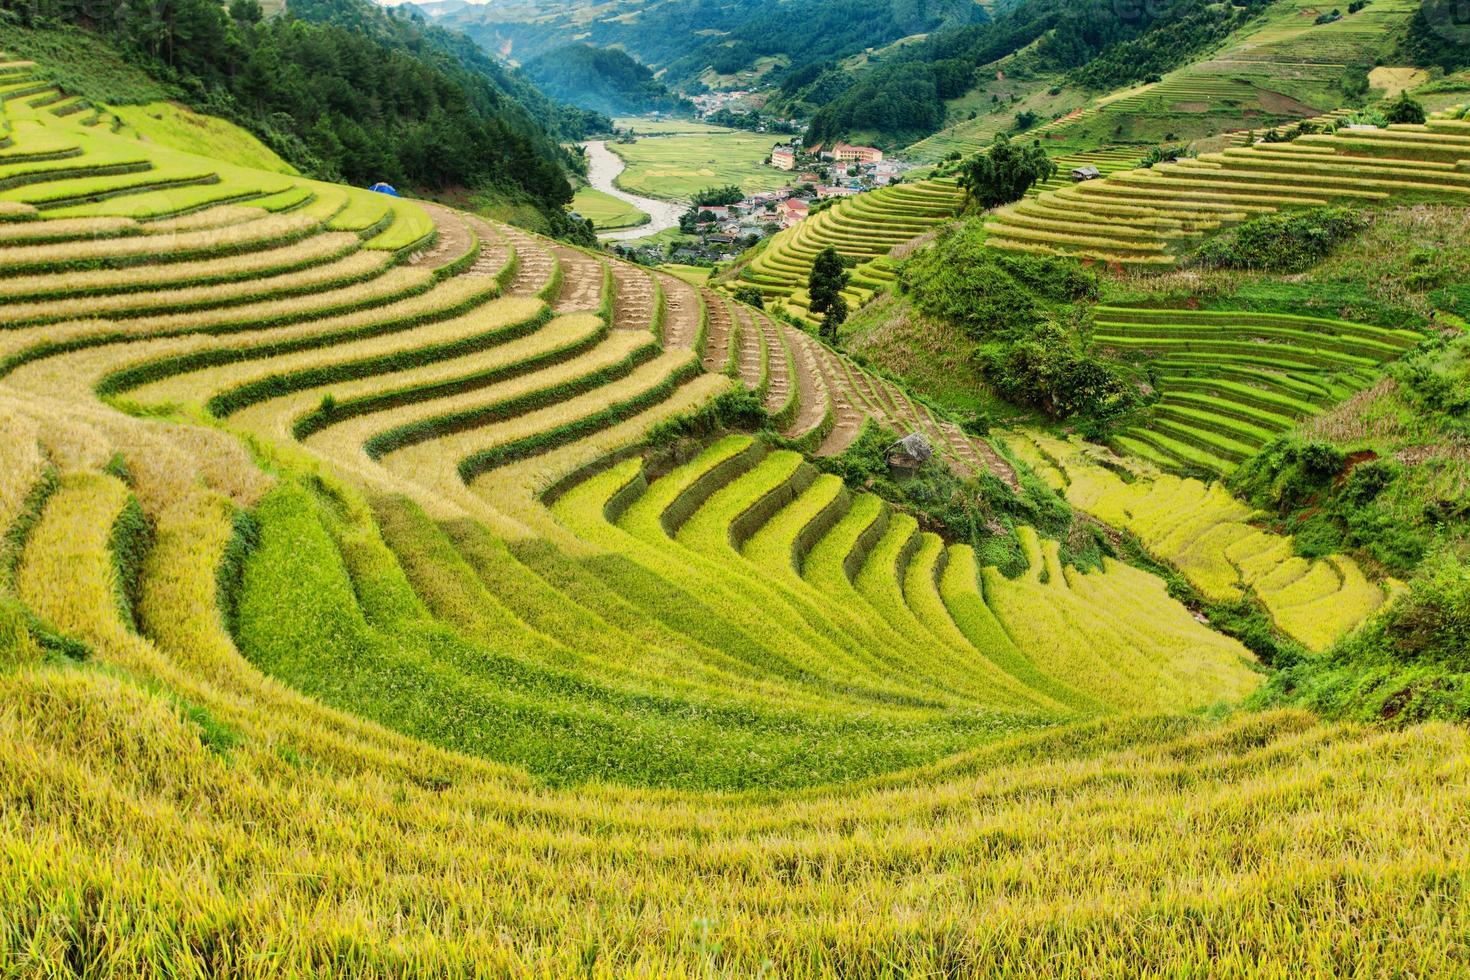 Rice fields on terraced of Mu Cang Chai, YenBai, Vietnam photo